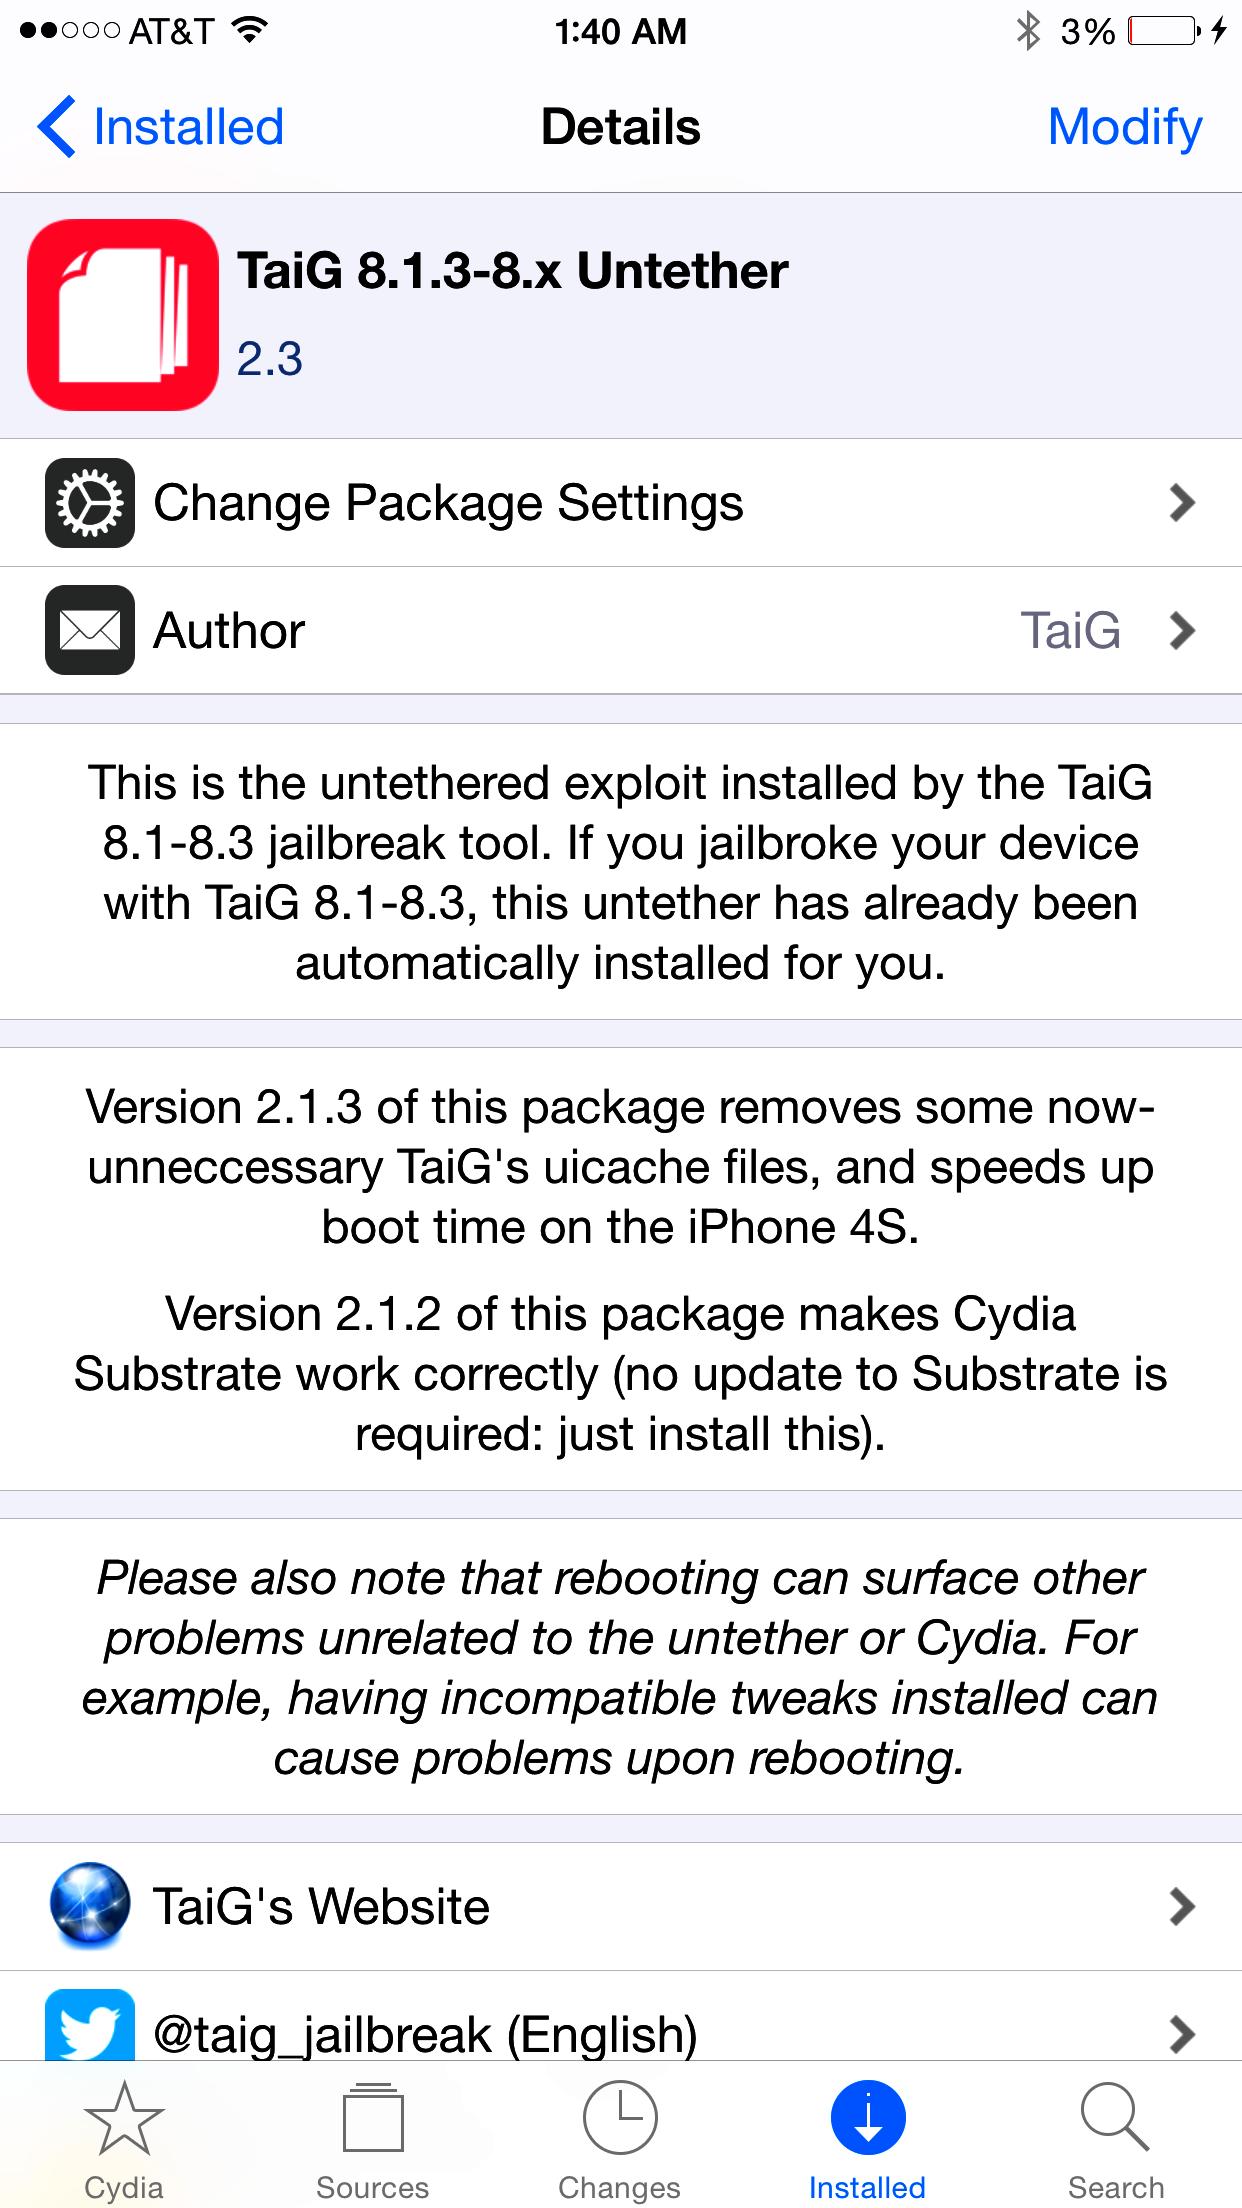 taig-2.3-on-Cydia-ios8.3-8.4-iapptweak